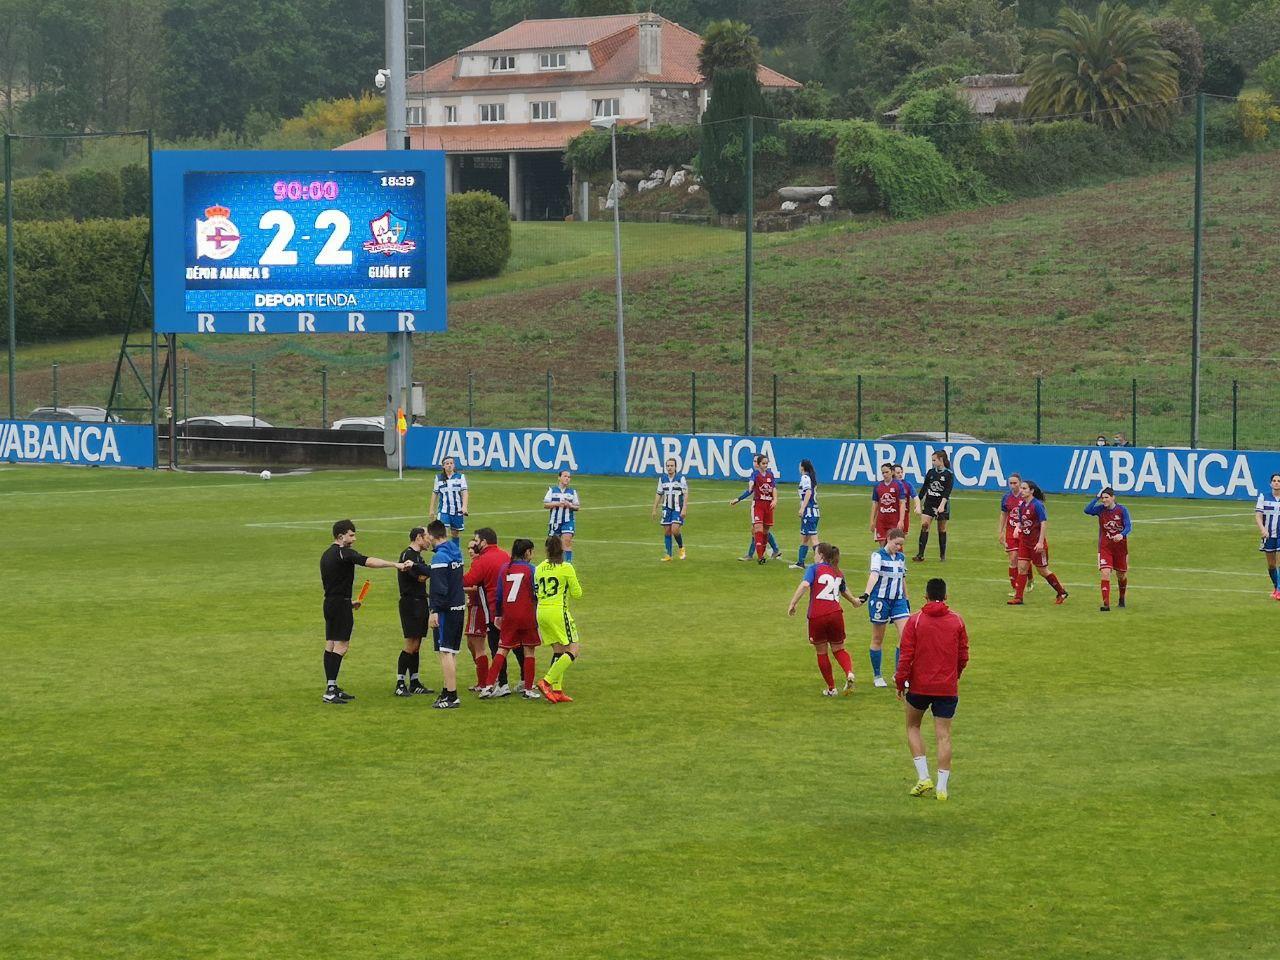 Depor ABANCA B vs Gijón FF / GIJÓN FF